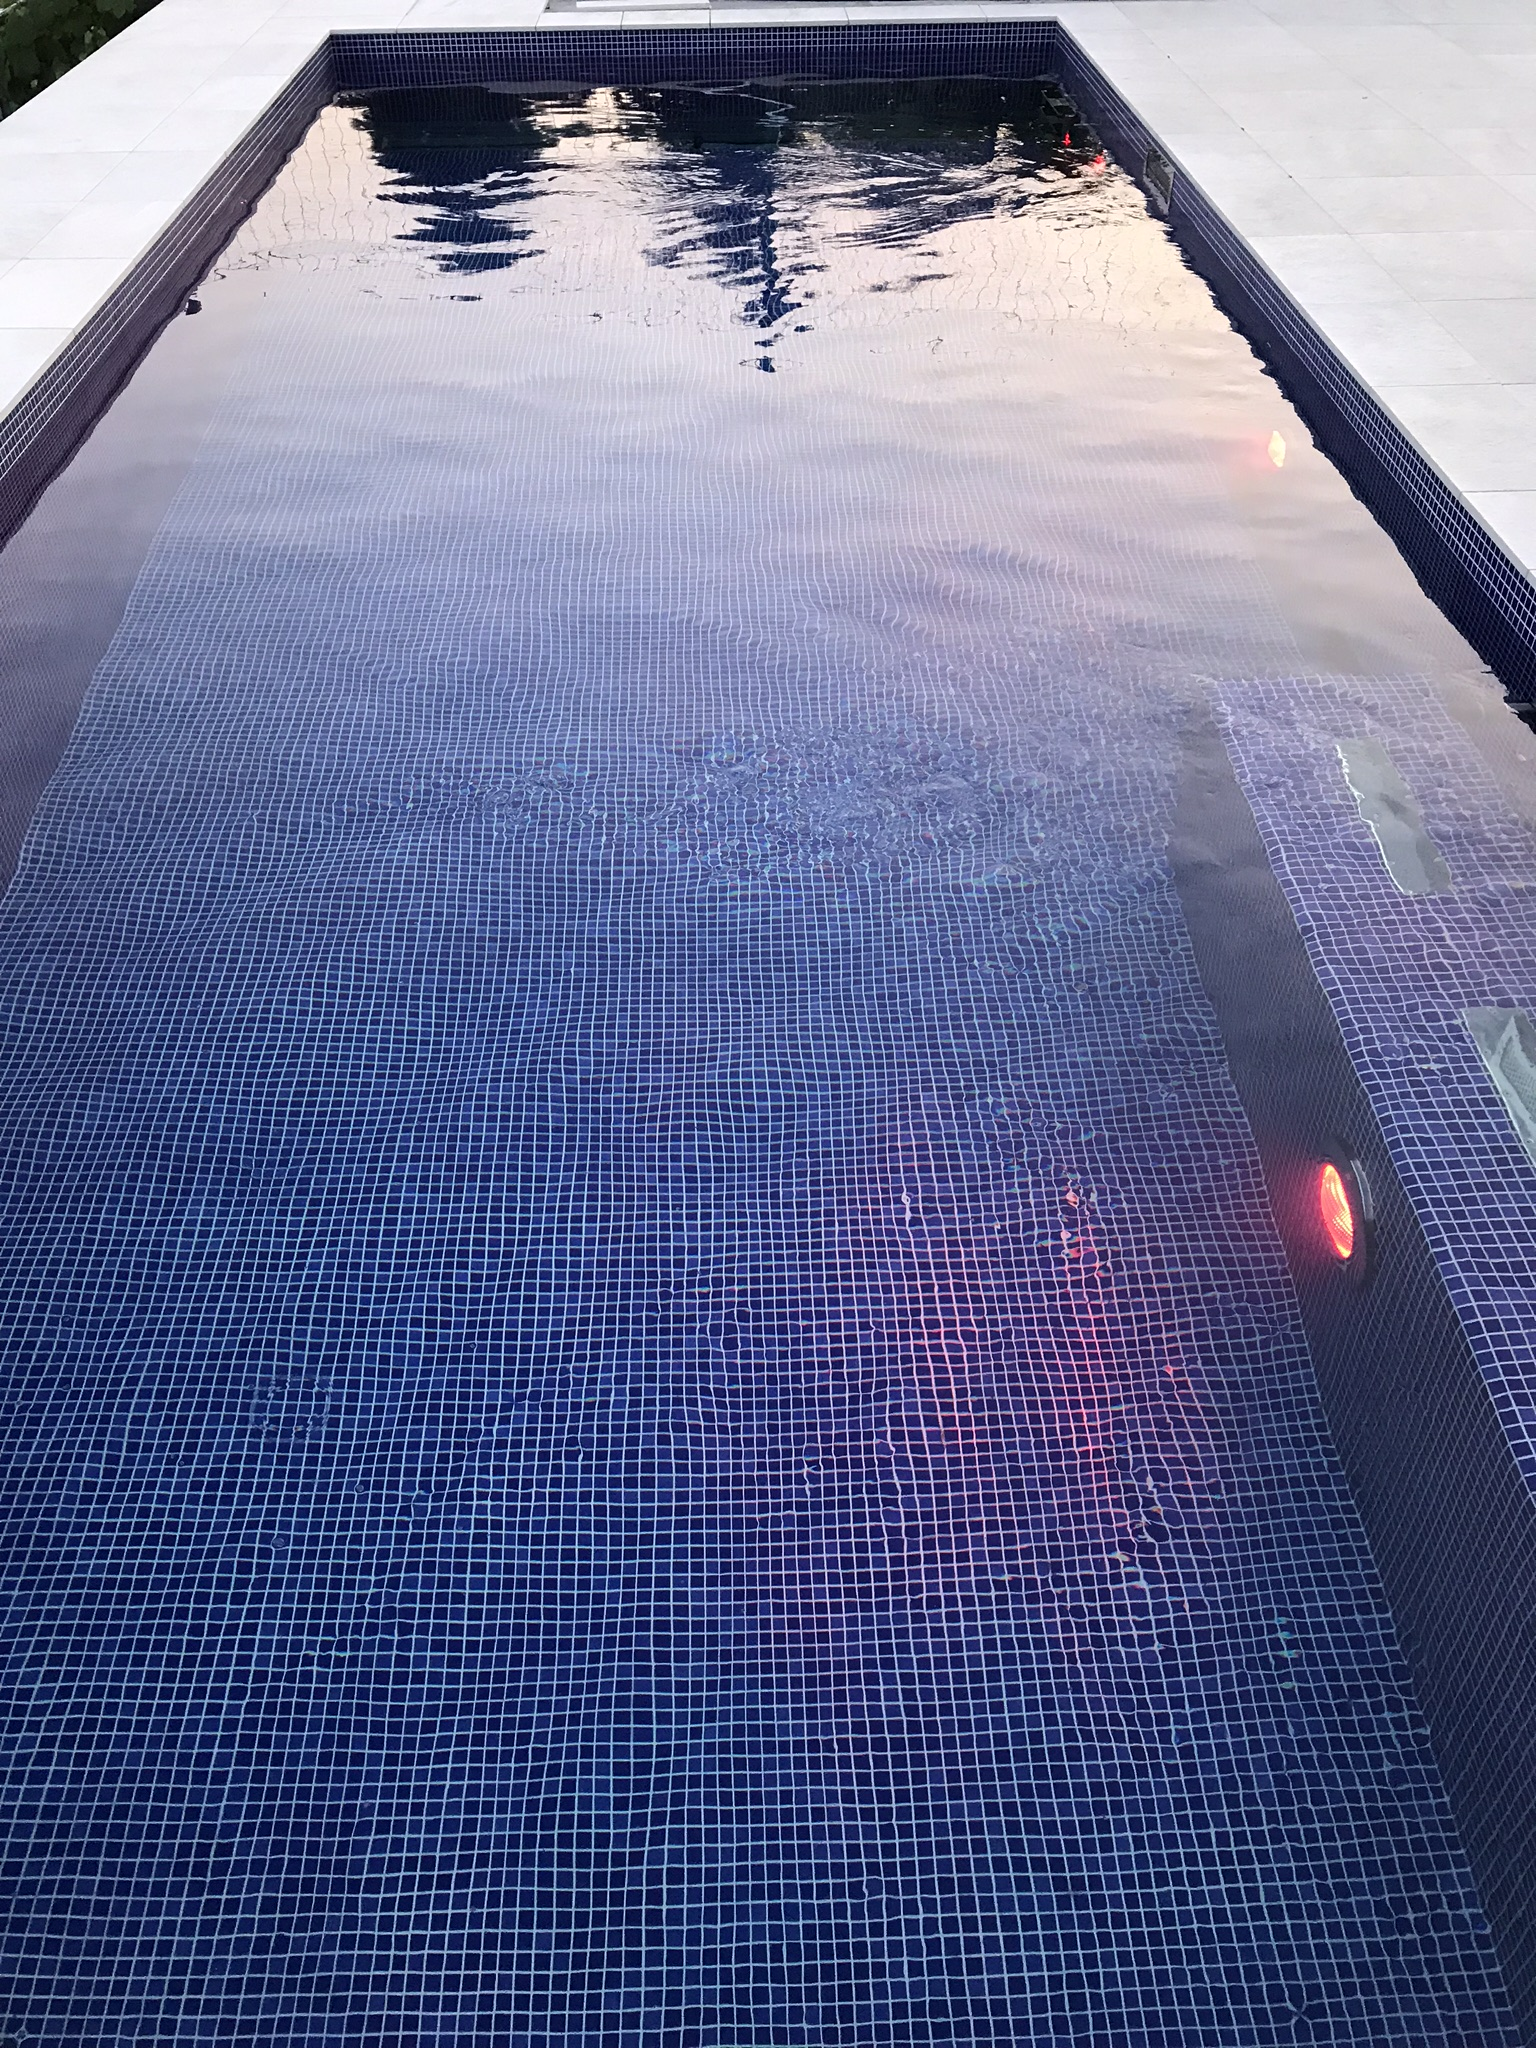 basen-roleta-dno-drabinka-mozaika-budowa basenu-ogrodowy-lampa basenowa-led